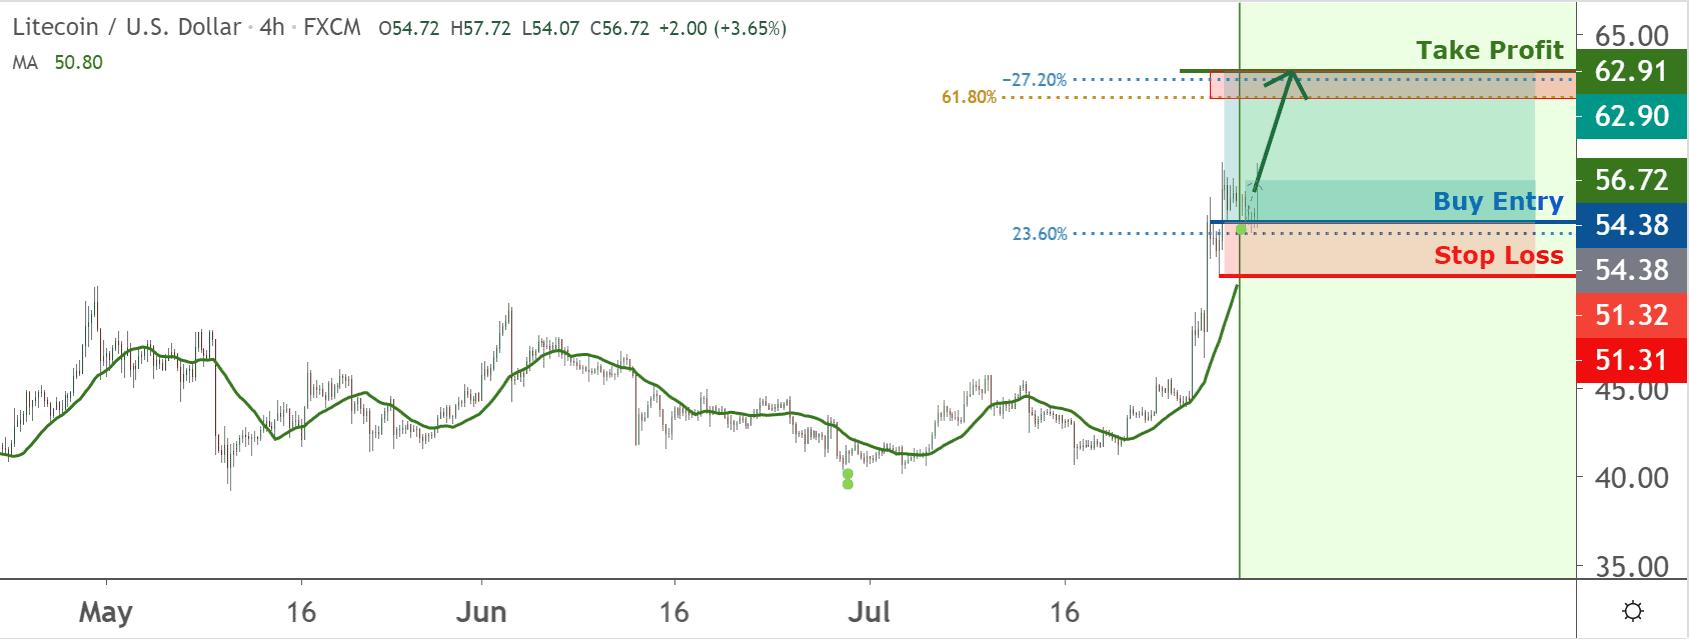 Litecoin price chart 2 - 30 July